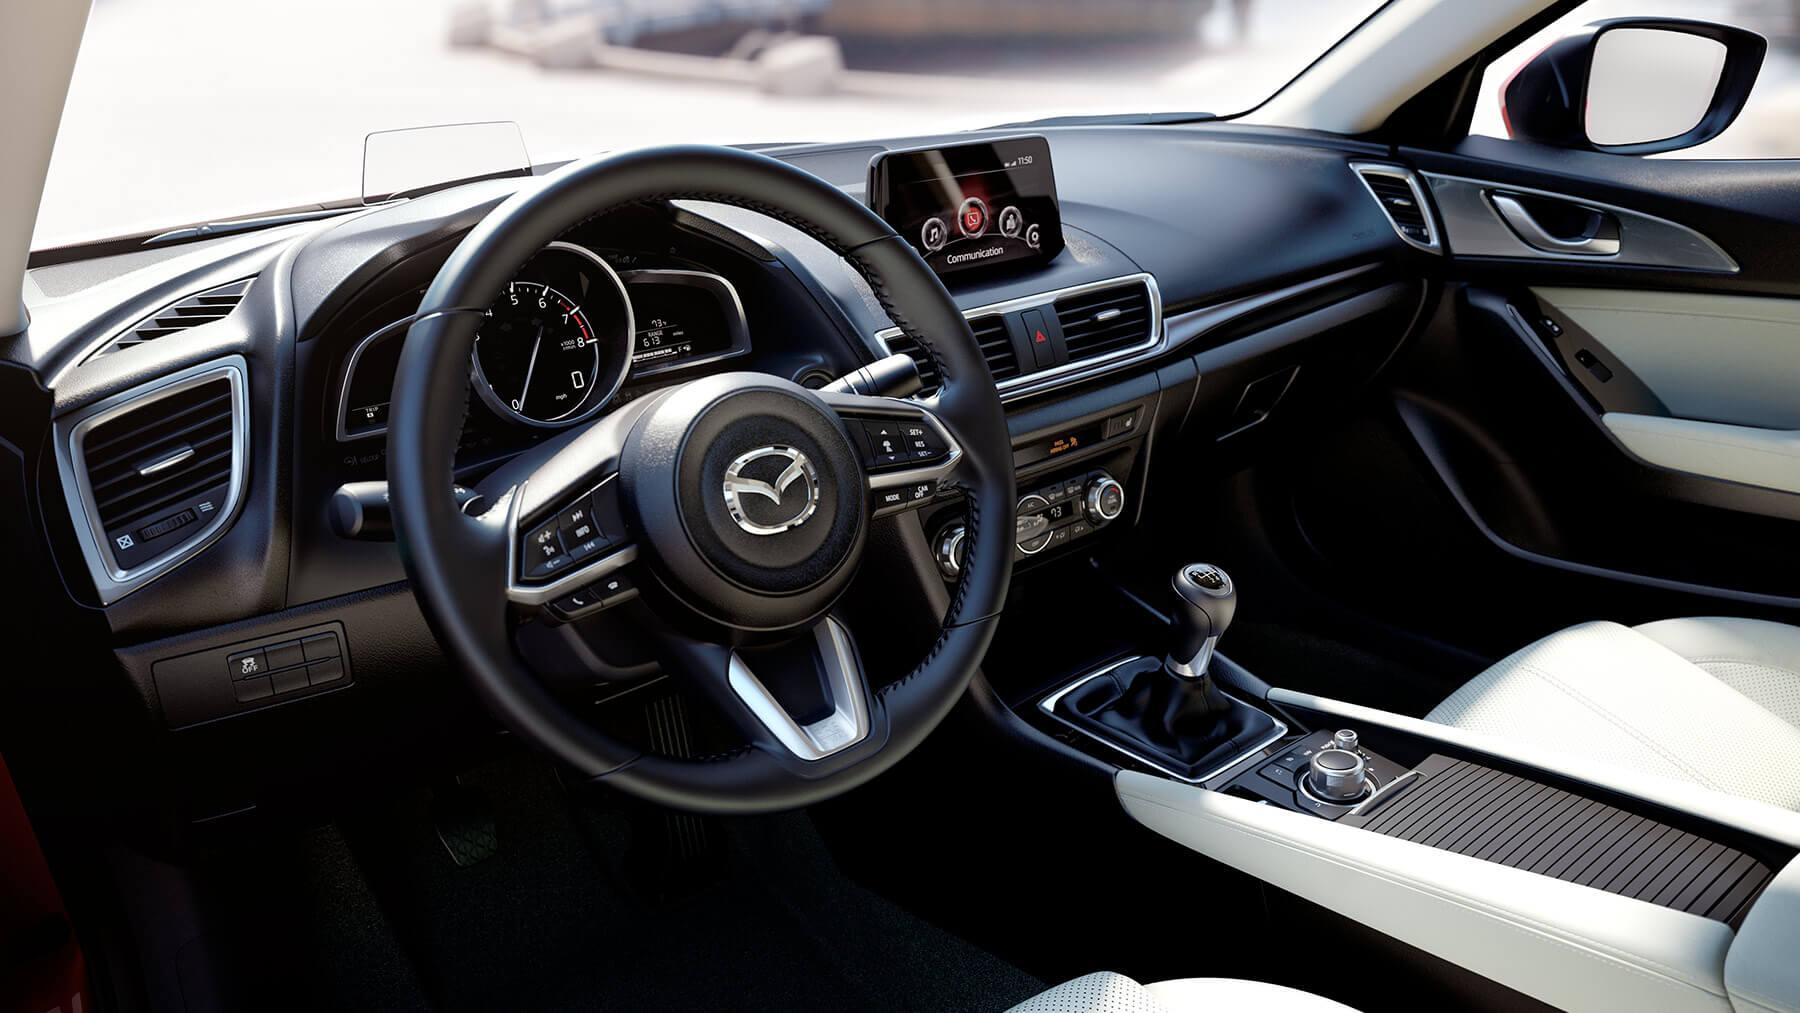 Galeria - Mazda 3 Sedán